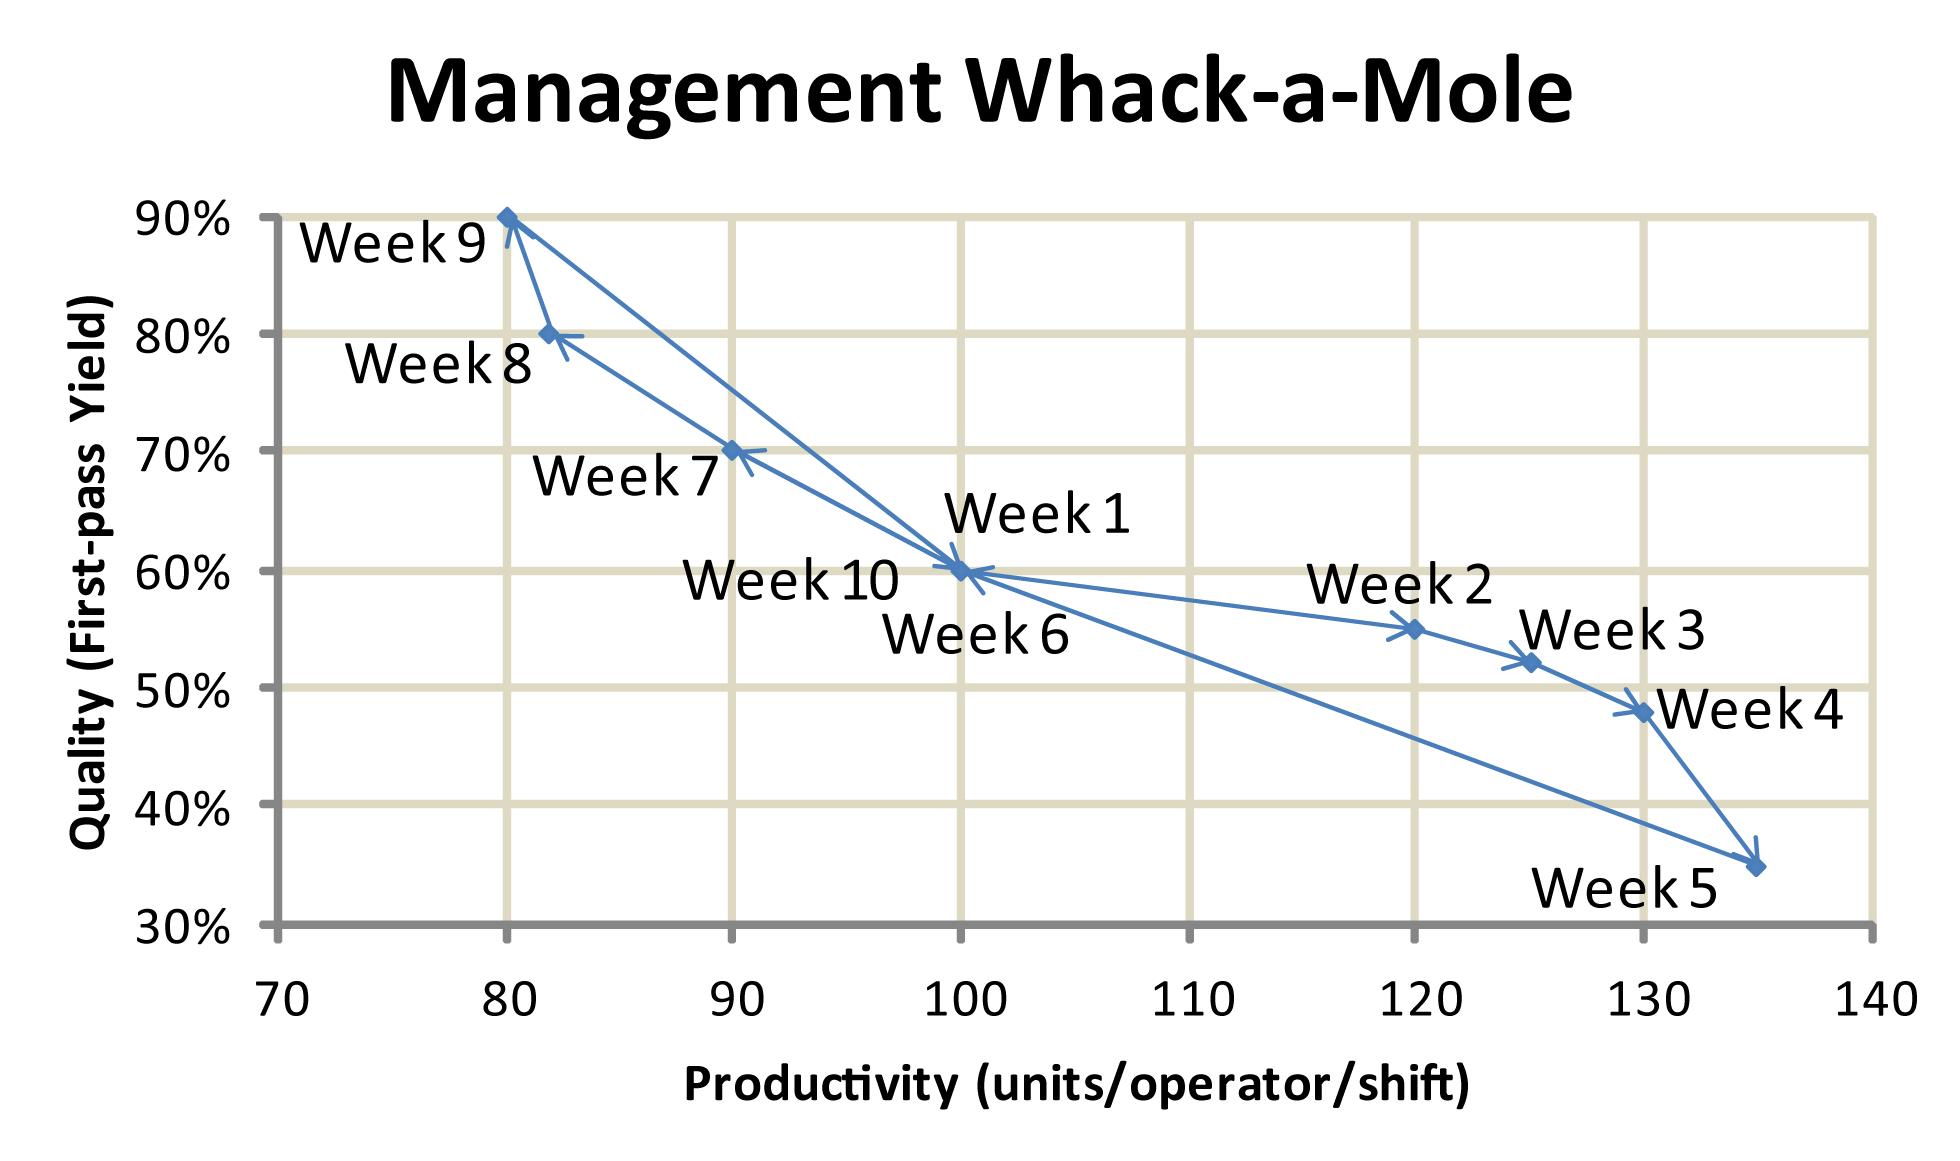 Orbit chart of Quality versus Productivity Whack-a-Mole